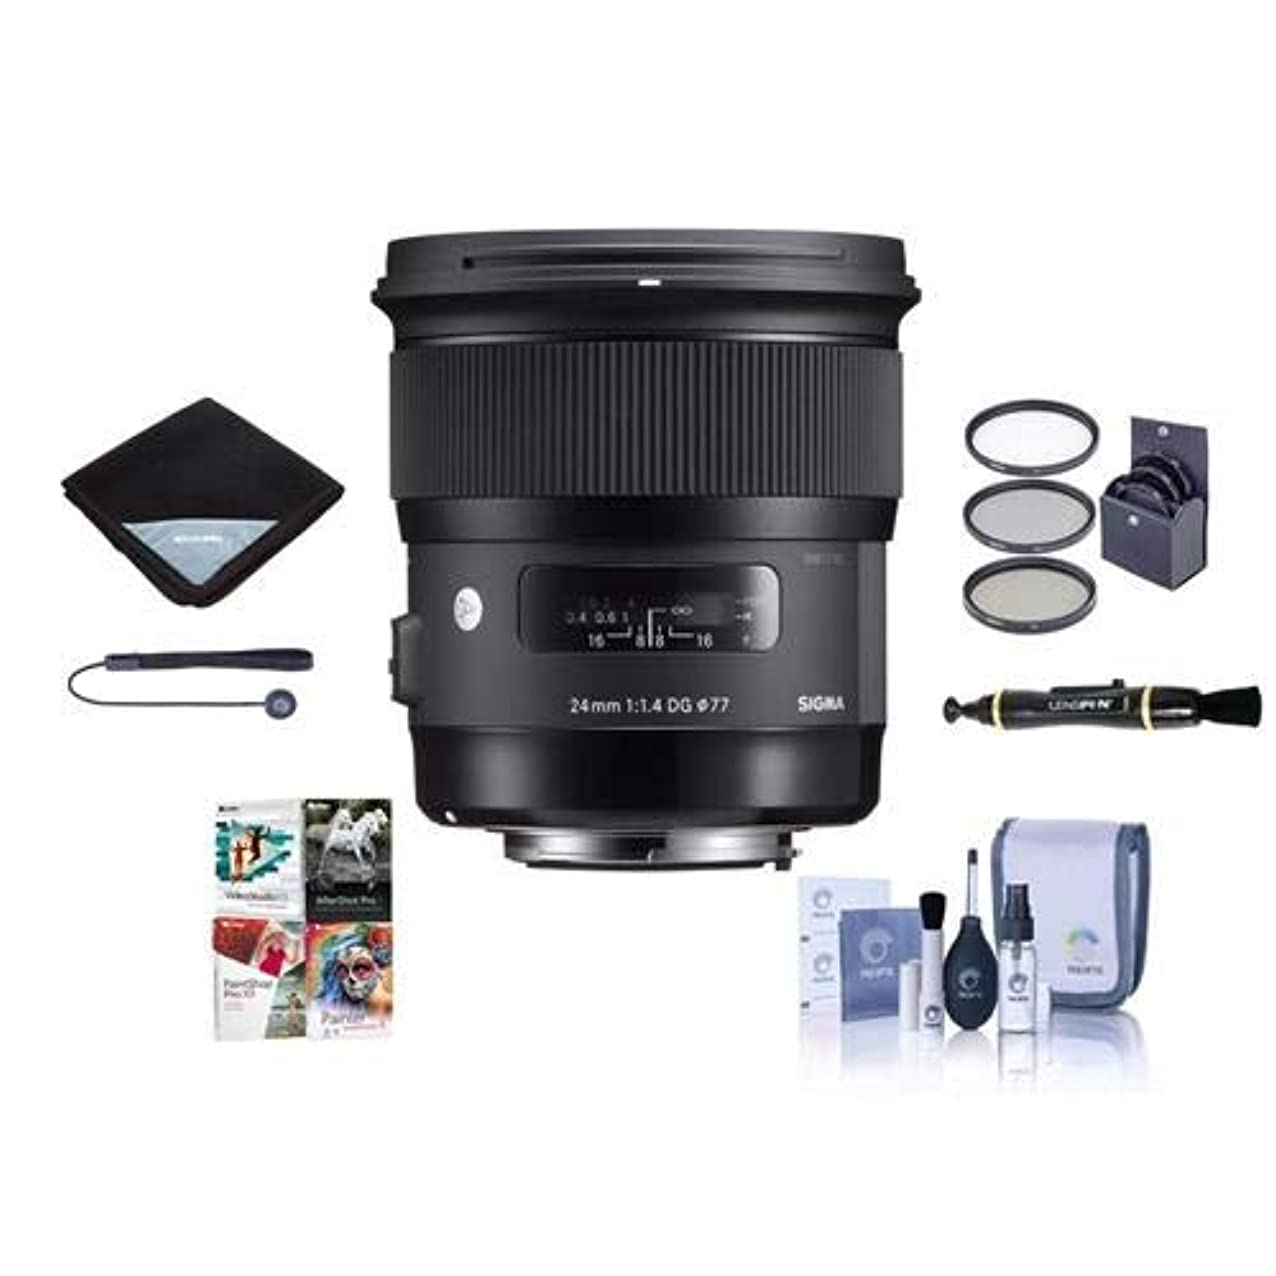 Sigma 24mm f/1.4 DG HSM Art Lens for Sony E-Mount Cameras, Black - Bundle with 77mm Filter Kit, Lens Wrap, Cleaning Kit, Capleash, Lenspen Lens Cleaner, PC Software Package nfelygjmwimnl861